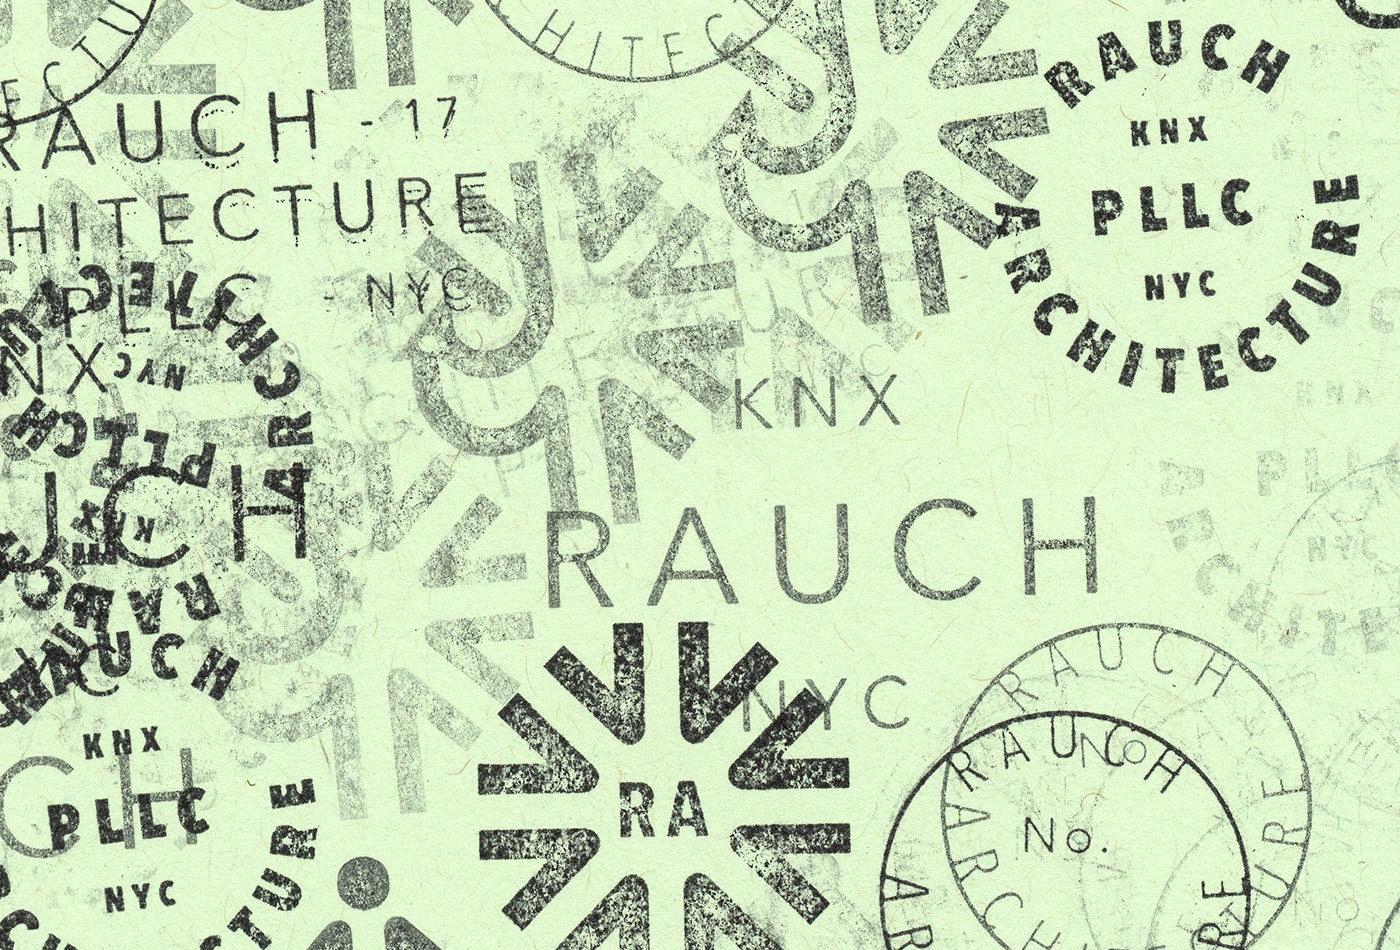 ra-rauch-architecture-matthew-rauch-architecture-pllc-nyc-brooklyn-knx-architect-ppx-modernism-passengerpigeonx-vacaliebres-marks-stamps